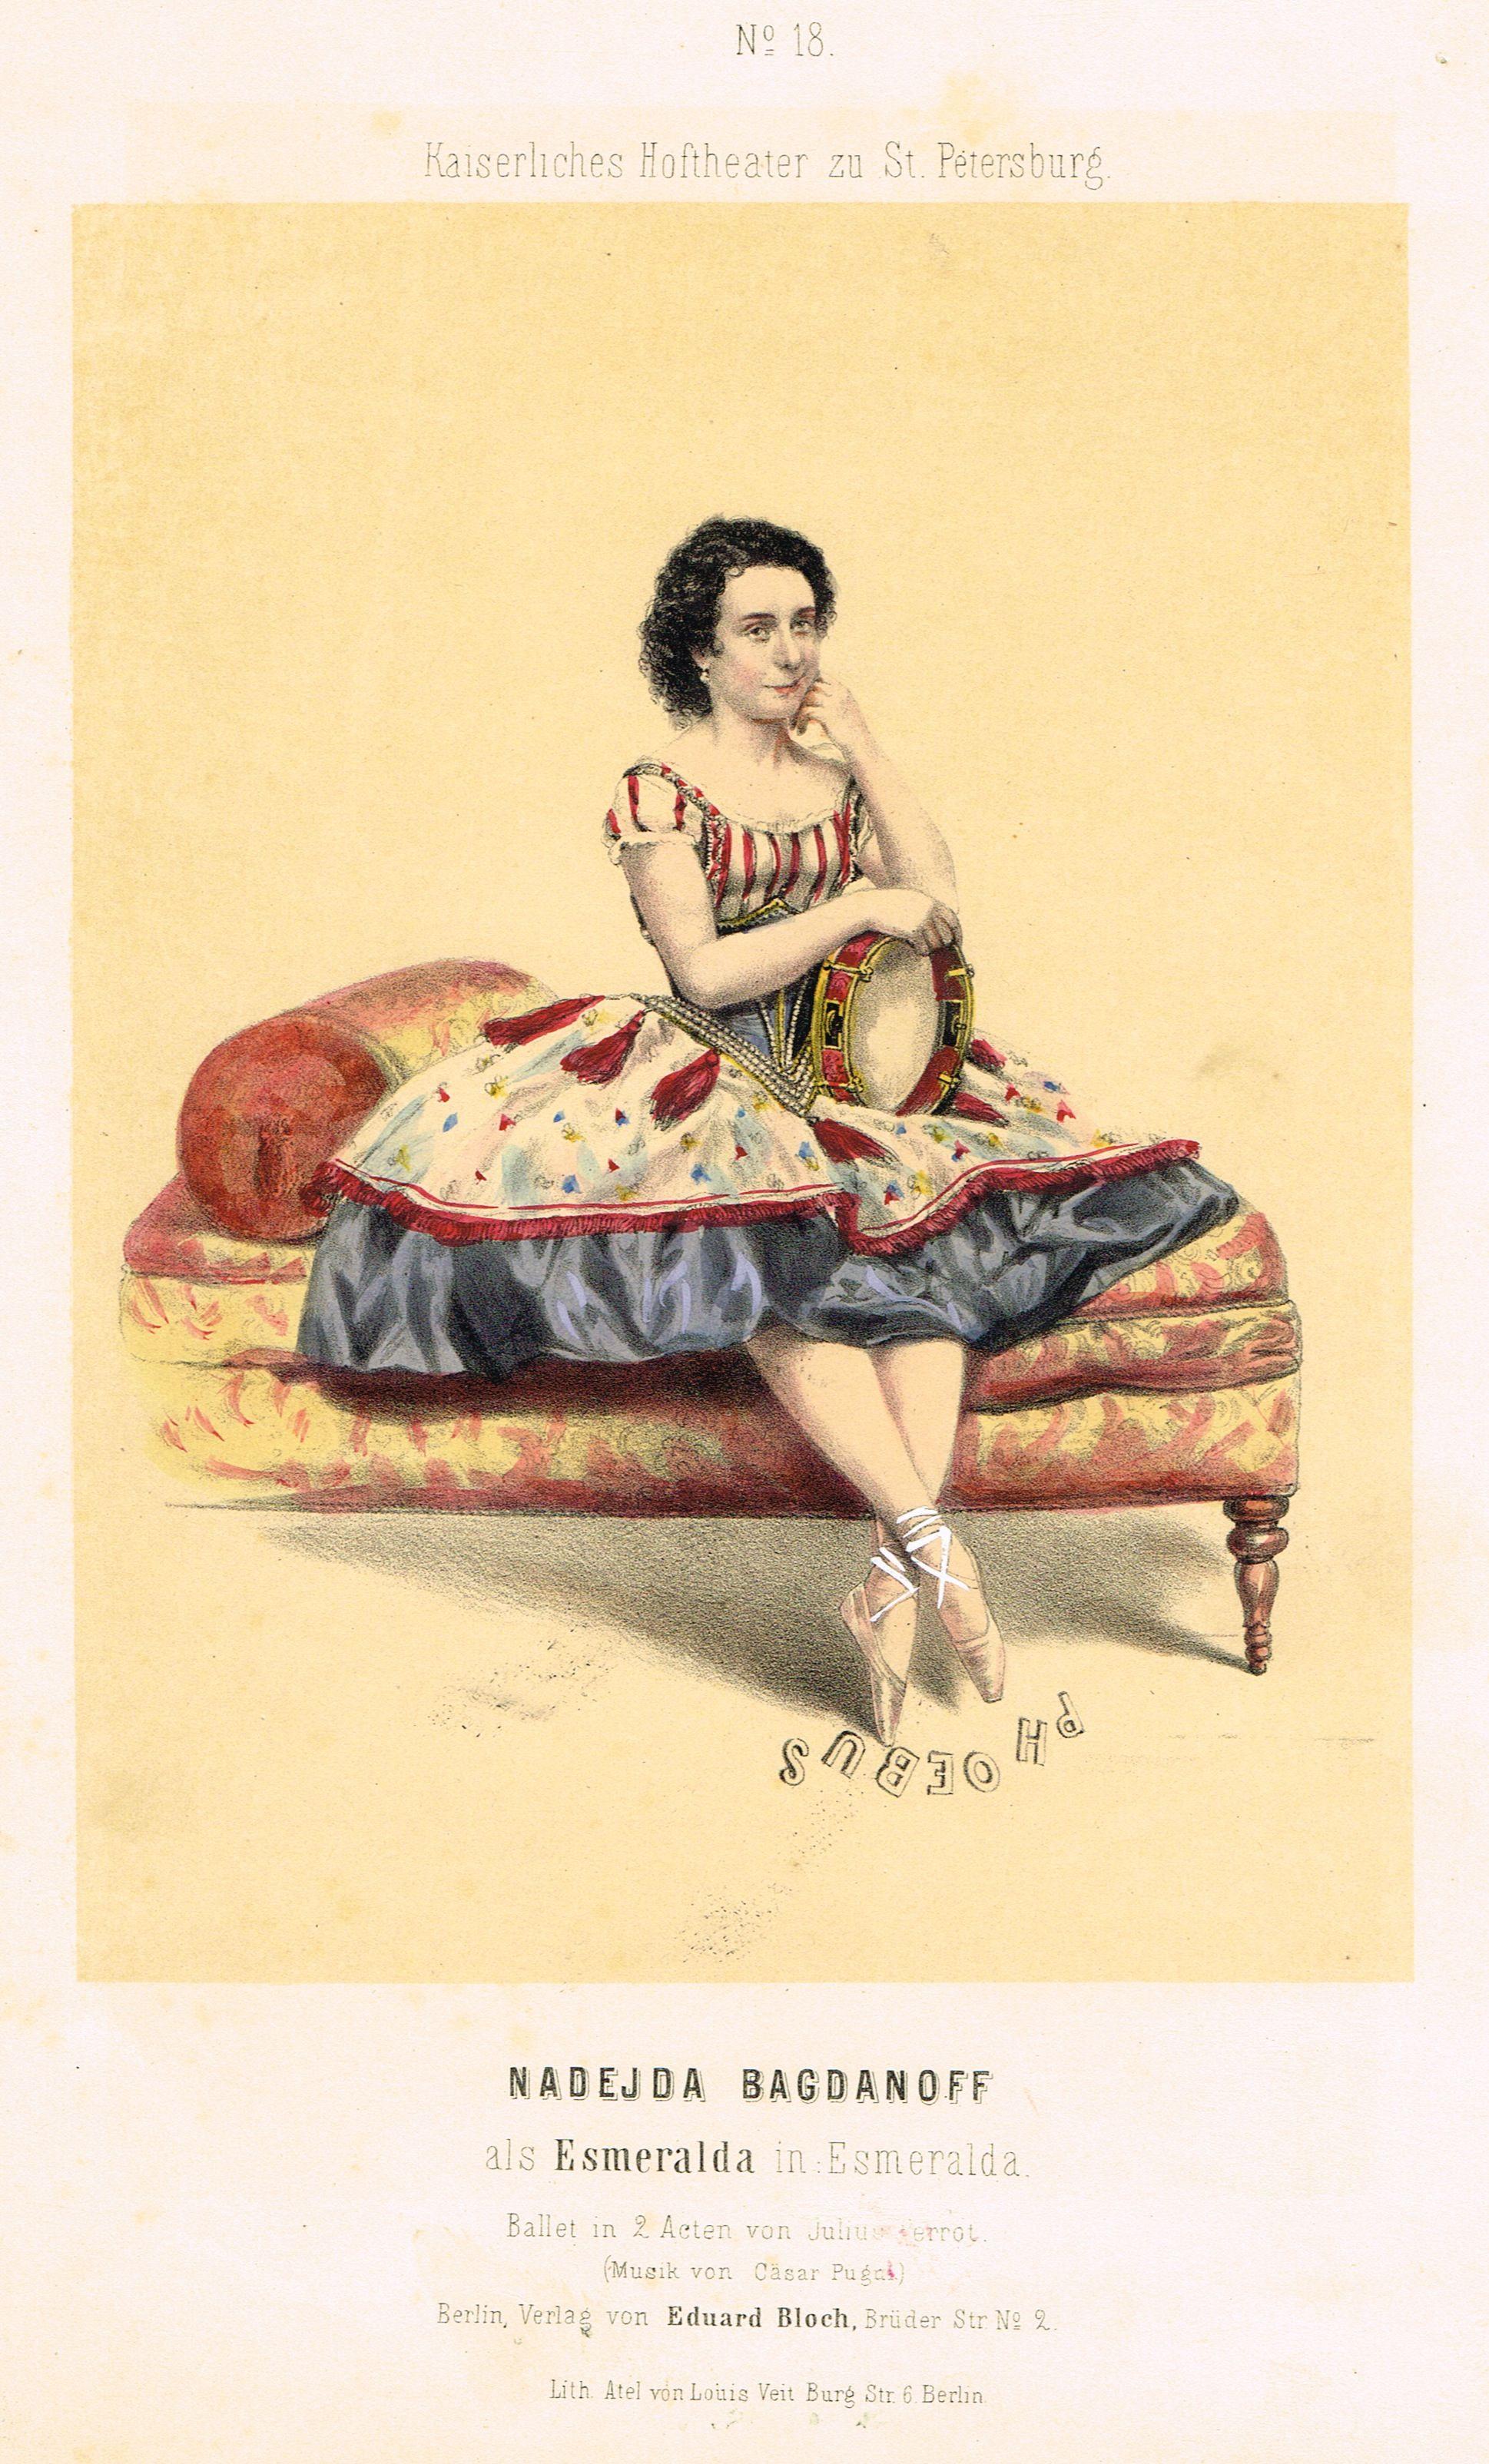 Nadejda Bagdanoff Ou Bogdonova 1836 1897 Dans Le Role D